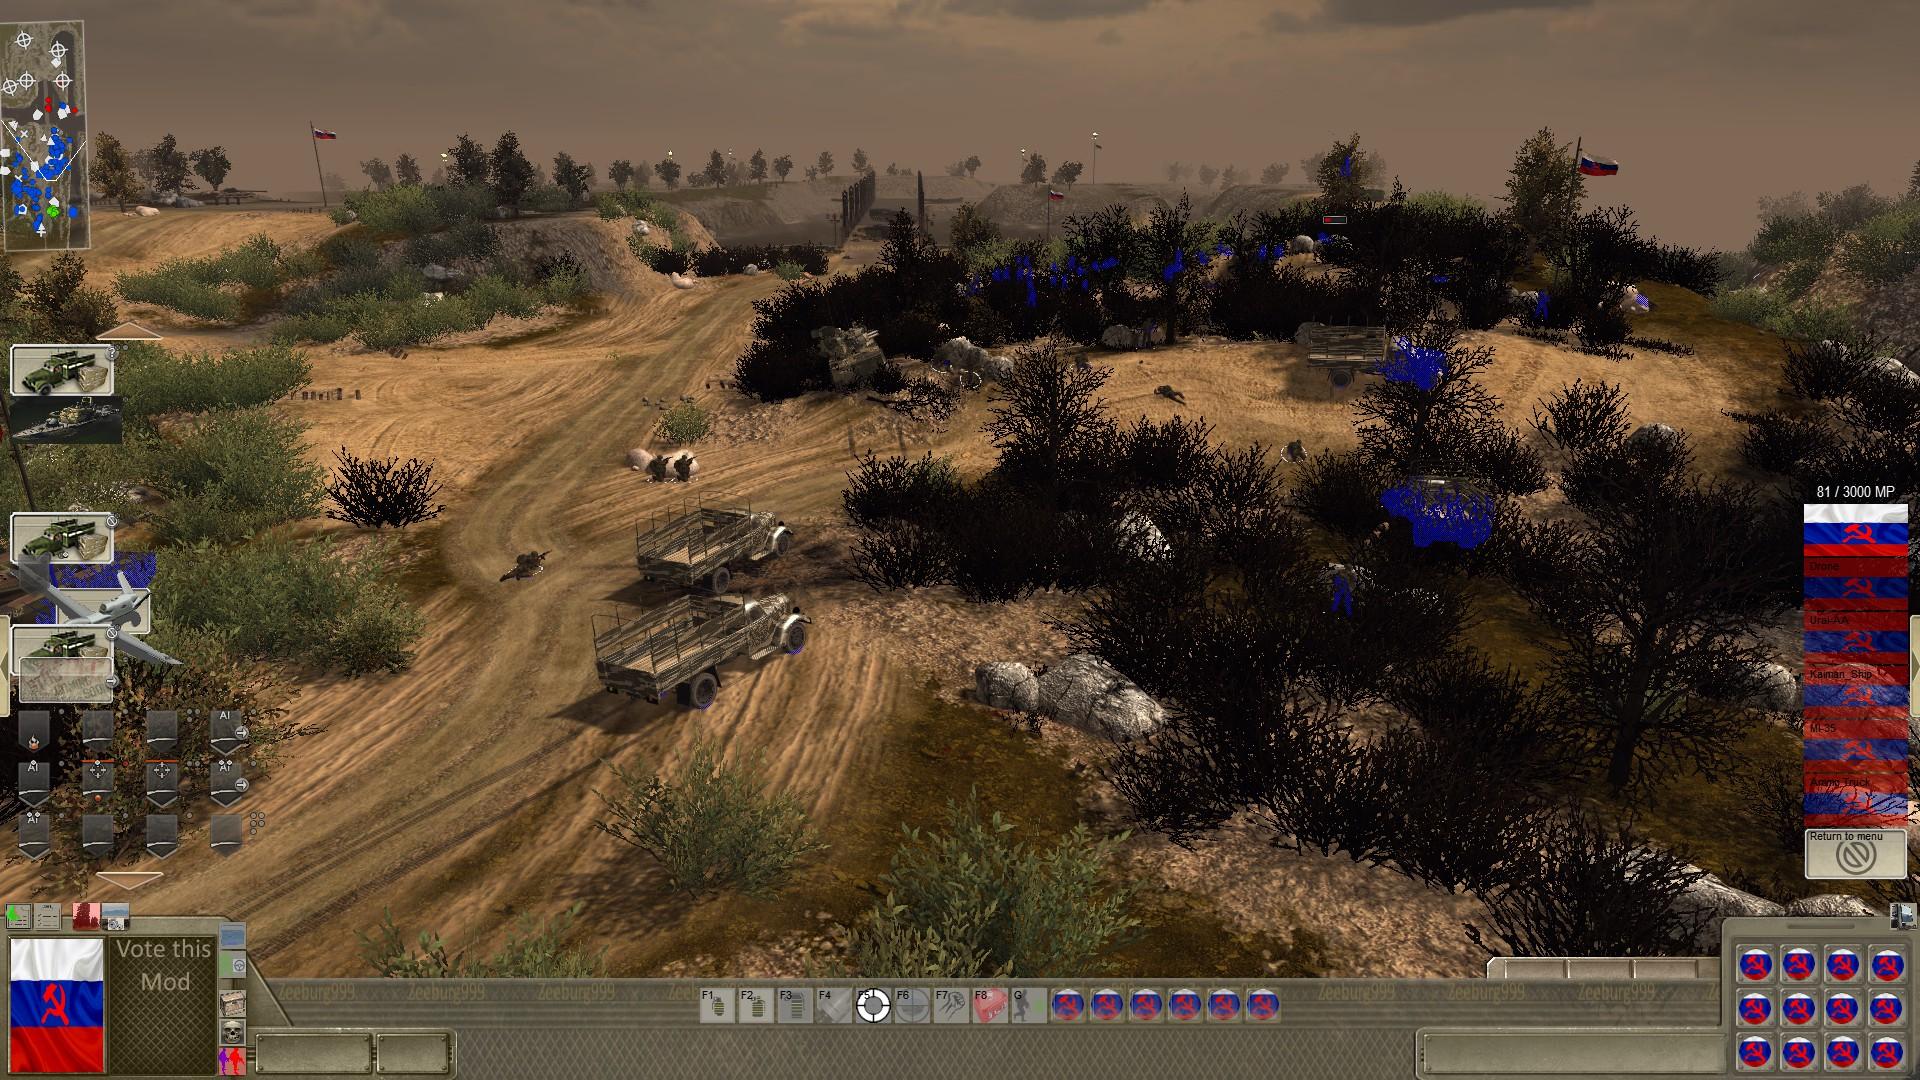 Скачать файл Zeeburg999 tno attack of the Rebels v1.0 (AS2 — 3.262.0) (v14.05.2019)